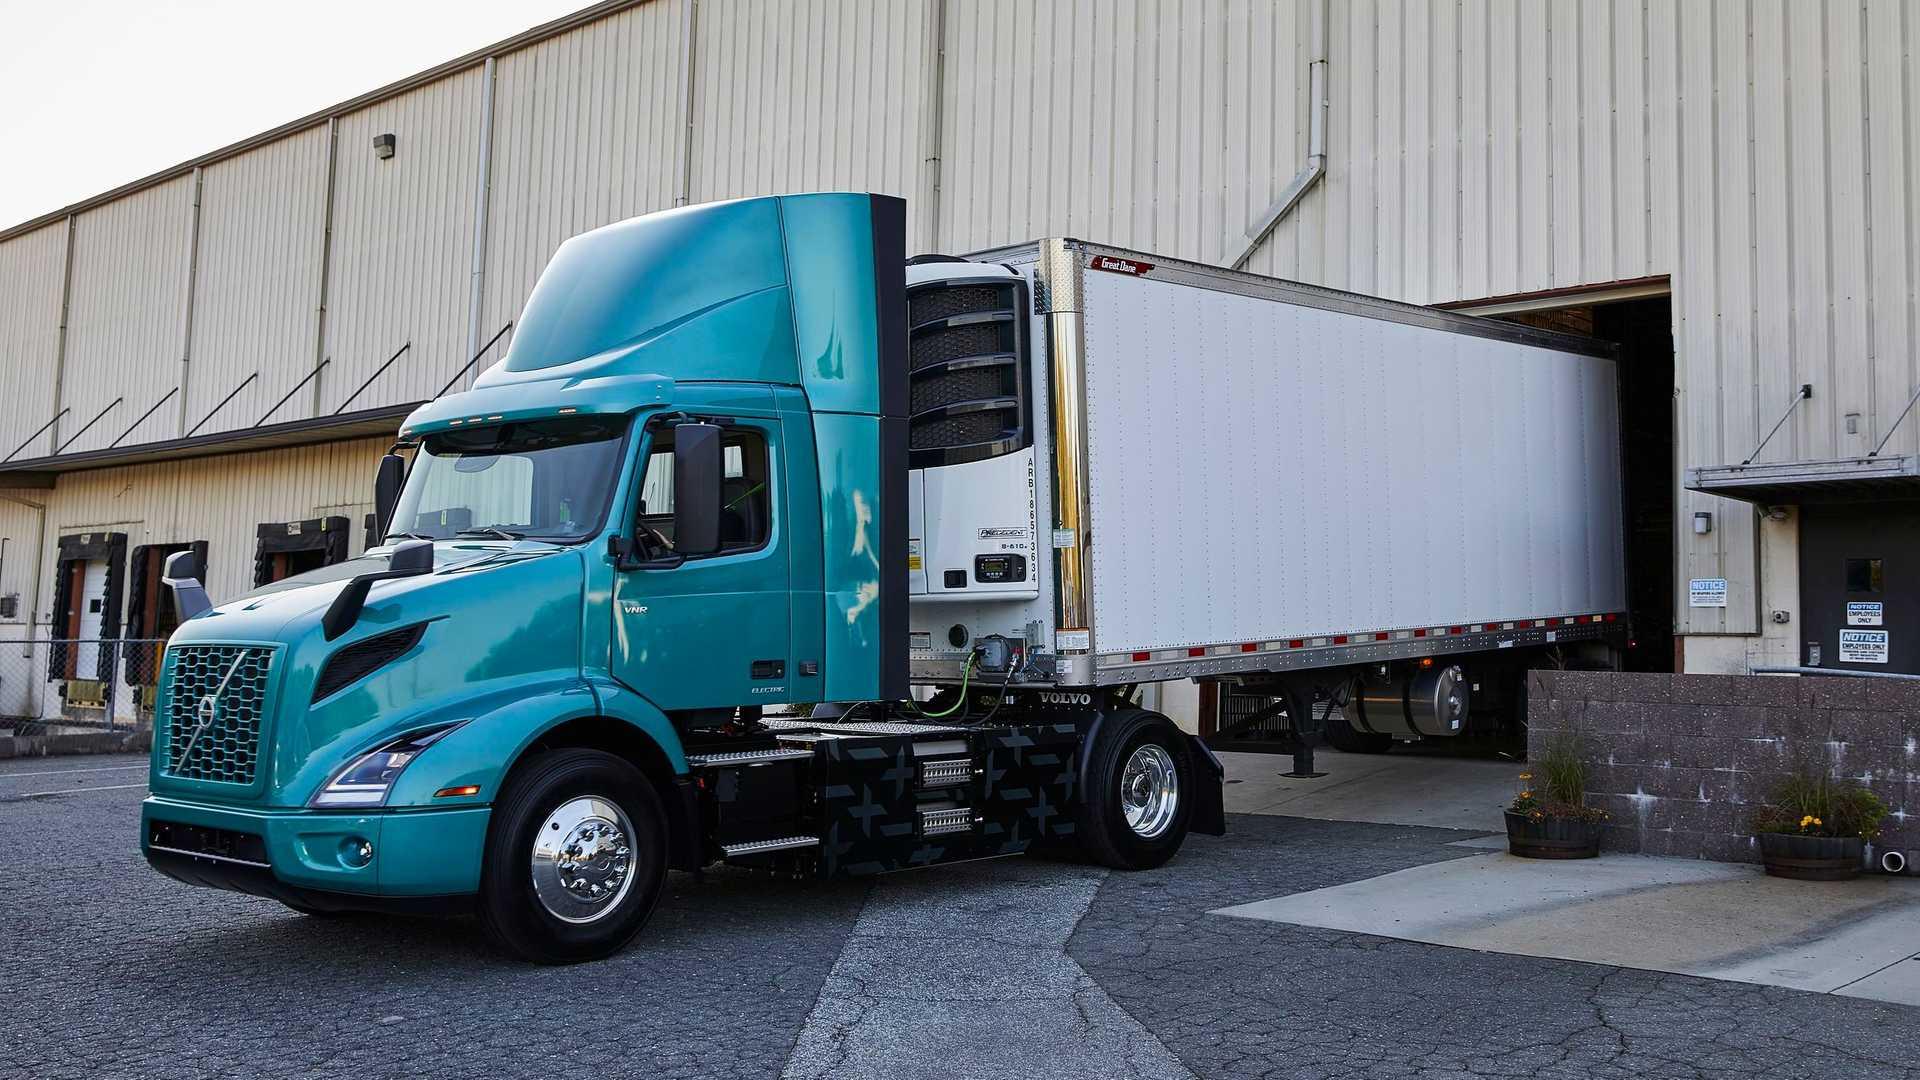 volvo vnr electric 1 اولین کامیون تمام برقی Volvo Trucks معرفی شد اخبار IT